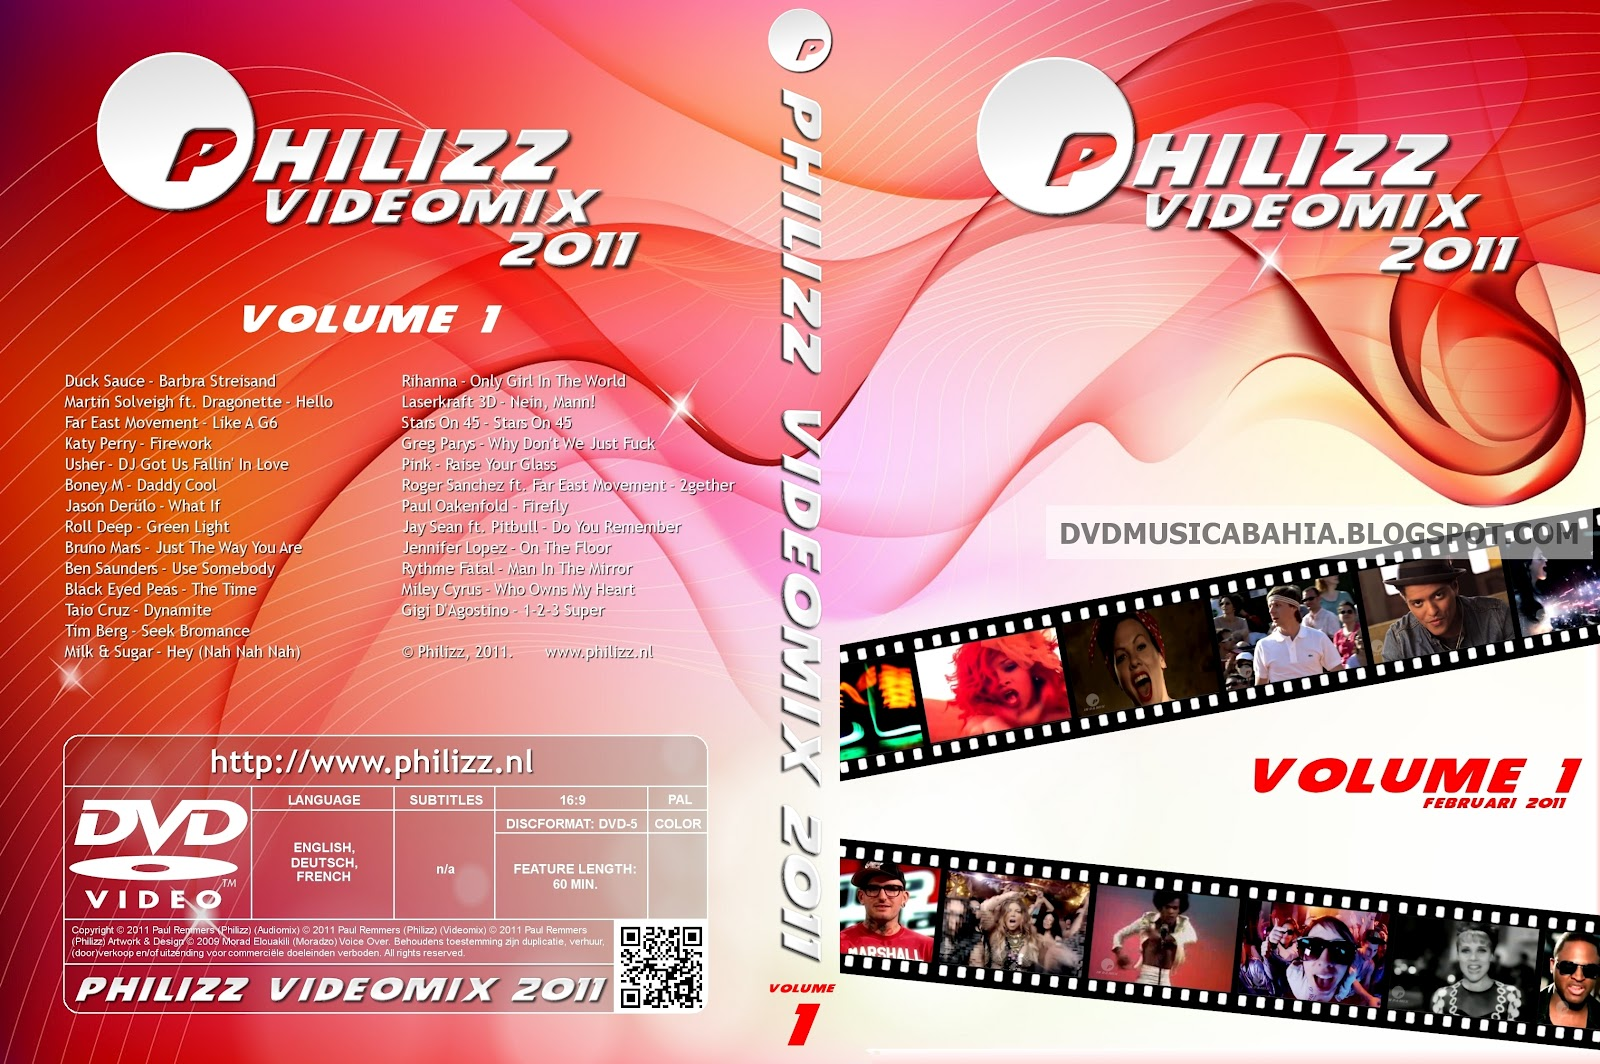 http://1.bp.blogspot.com/-4beH2r-Pirs/UFSwHlQ1U8I/AAAAAAAACXI/PZpBwY-vthU/s1600/PHILIZZ+-++VIDEOMIX+2011+VOL.+1.jpg